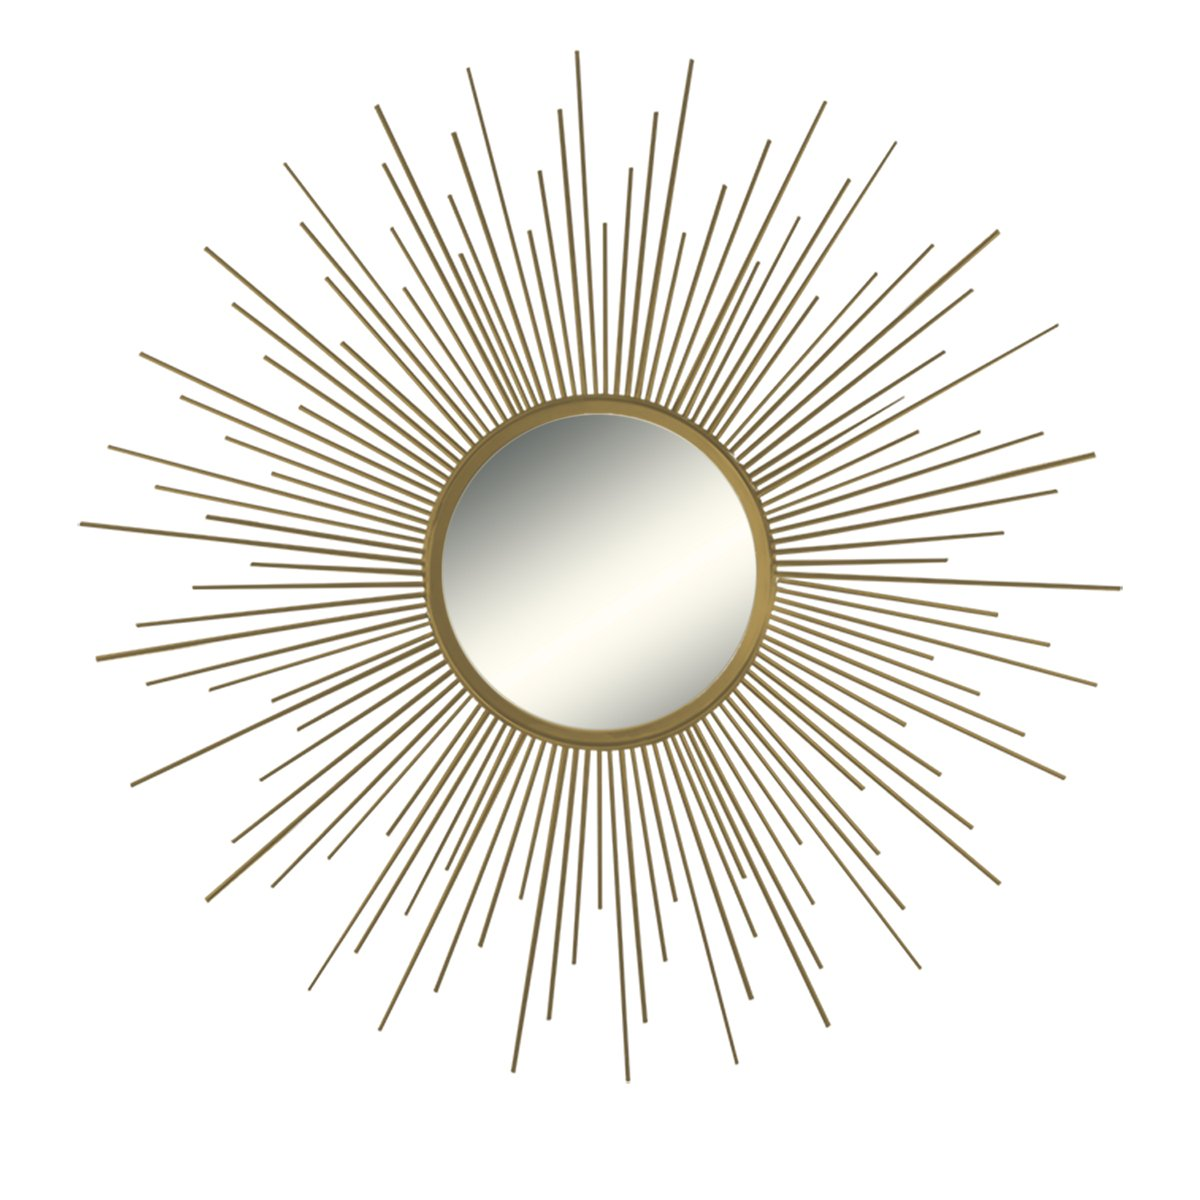 36 Quot Decorative Wall Hanging Mirror In Sunburst Shape